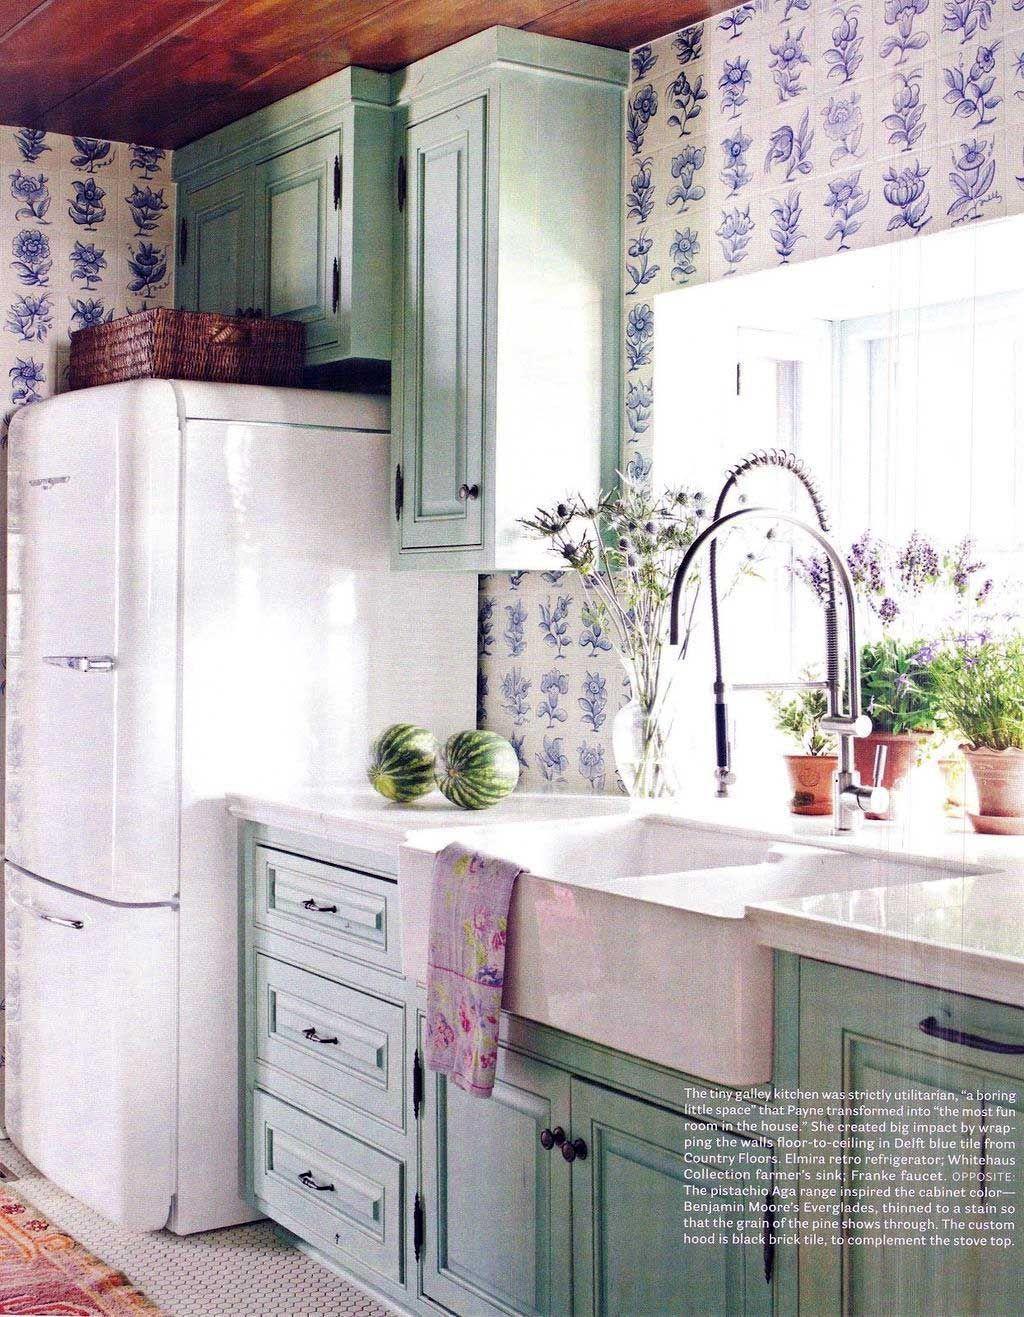 Exceptional 54 Retro Kitchen Decoration Ideas Retro Kitchen Decor Kitchen Inspirations Home Decor Kitchen